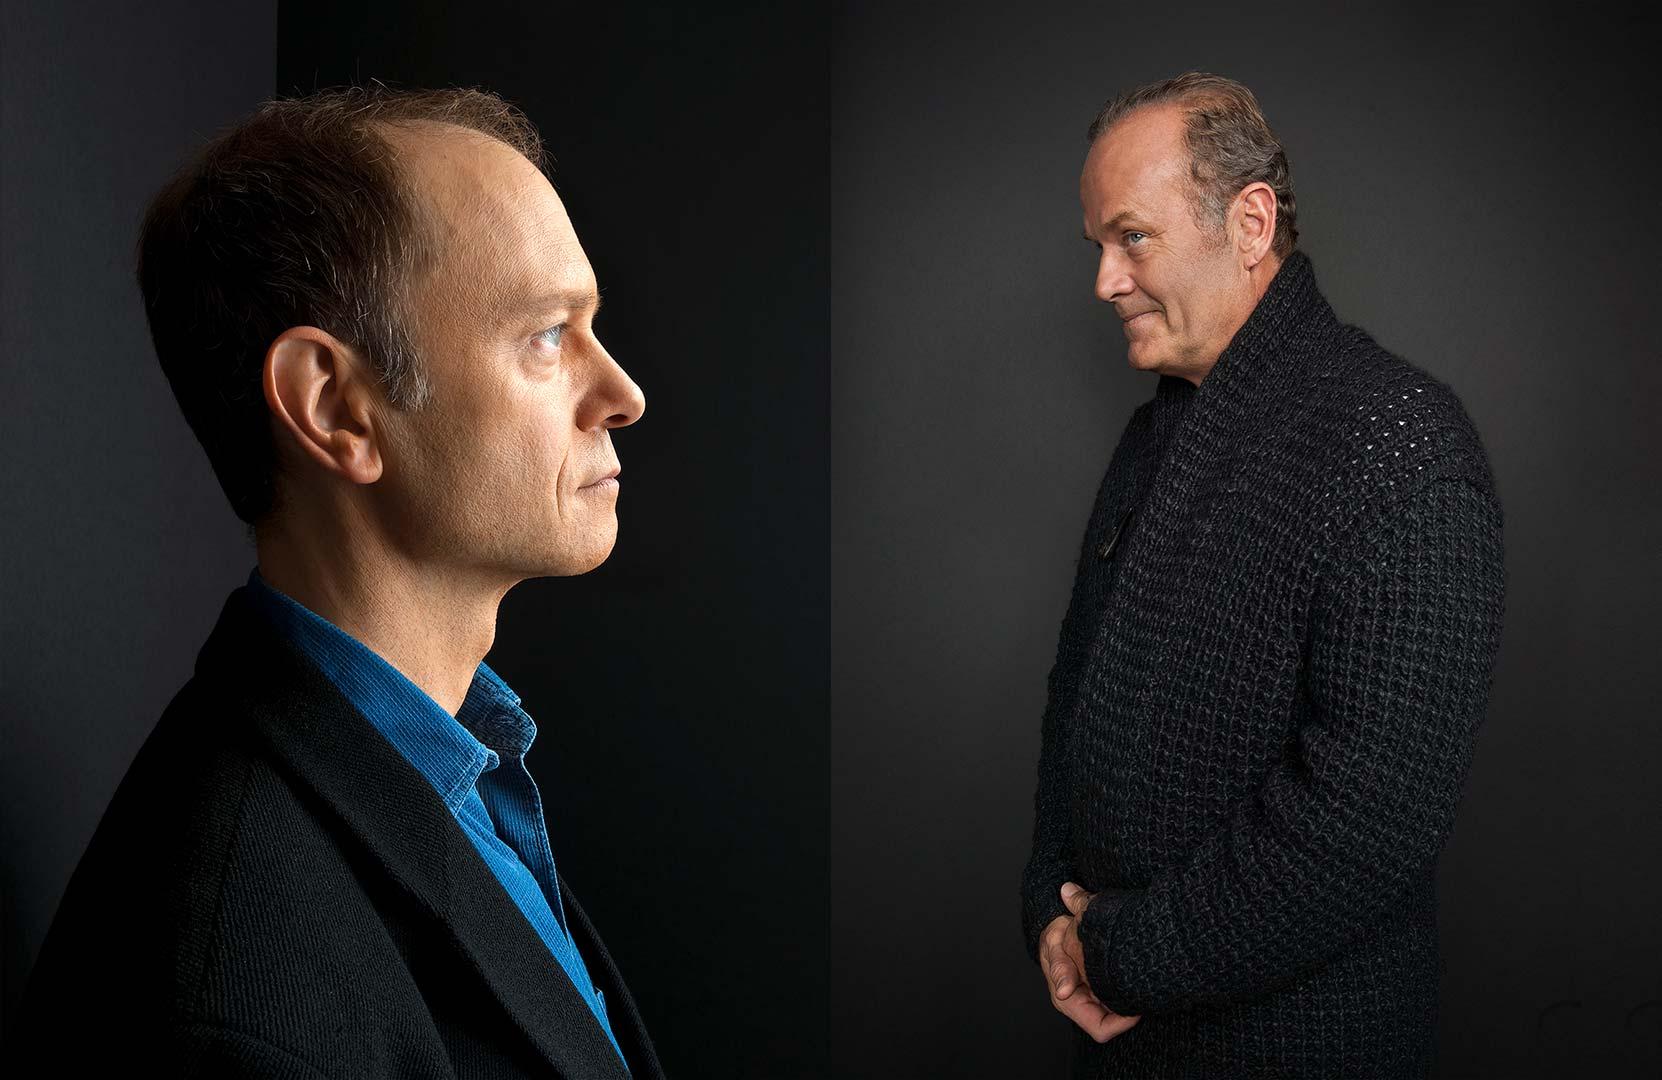 Celebrity portrait photography of David Hyde Pierce and Kelsey Grammer